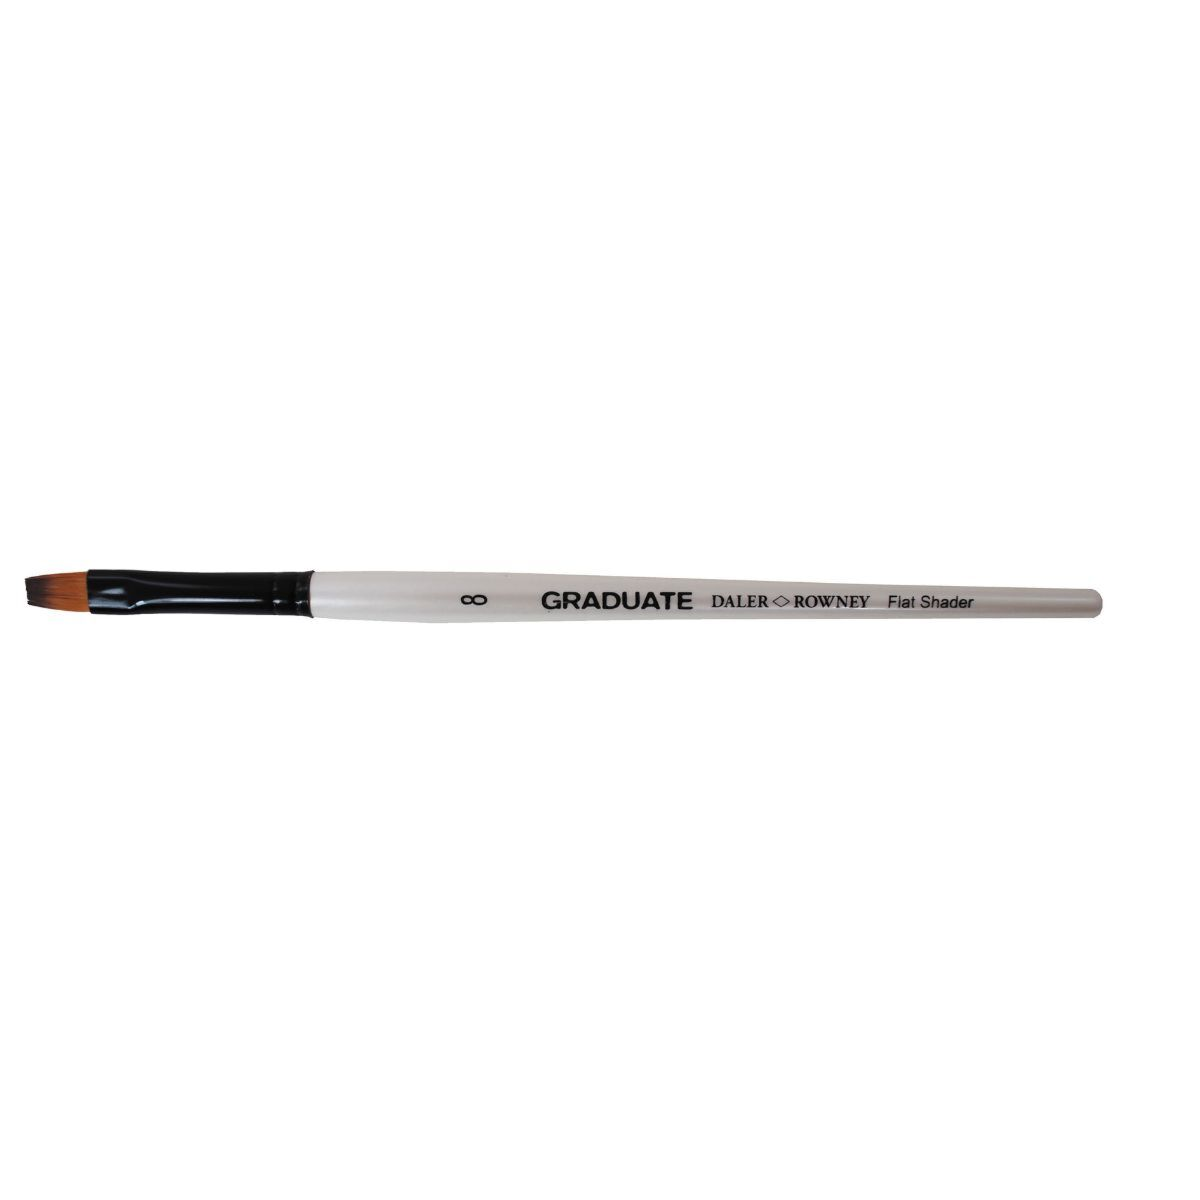 Daler Rowney Graduate Brush Flat Shader 8